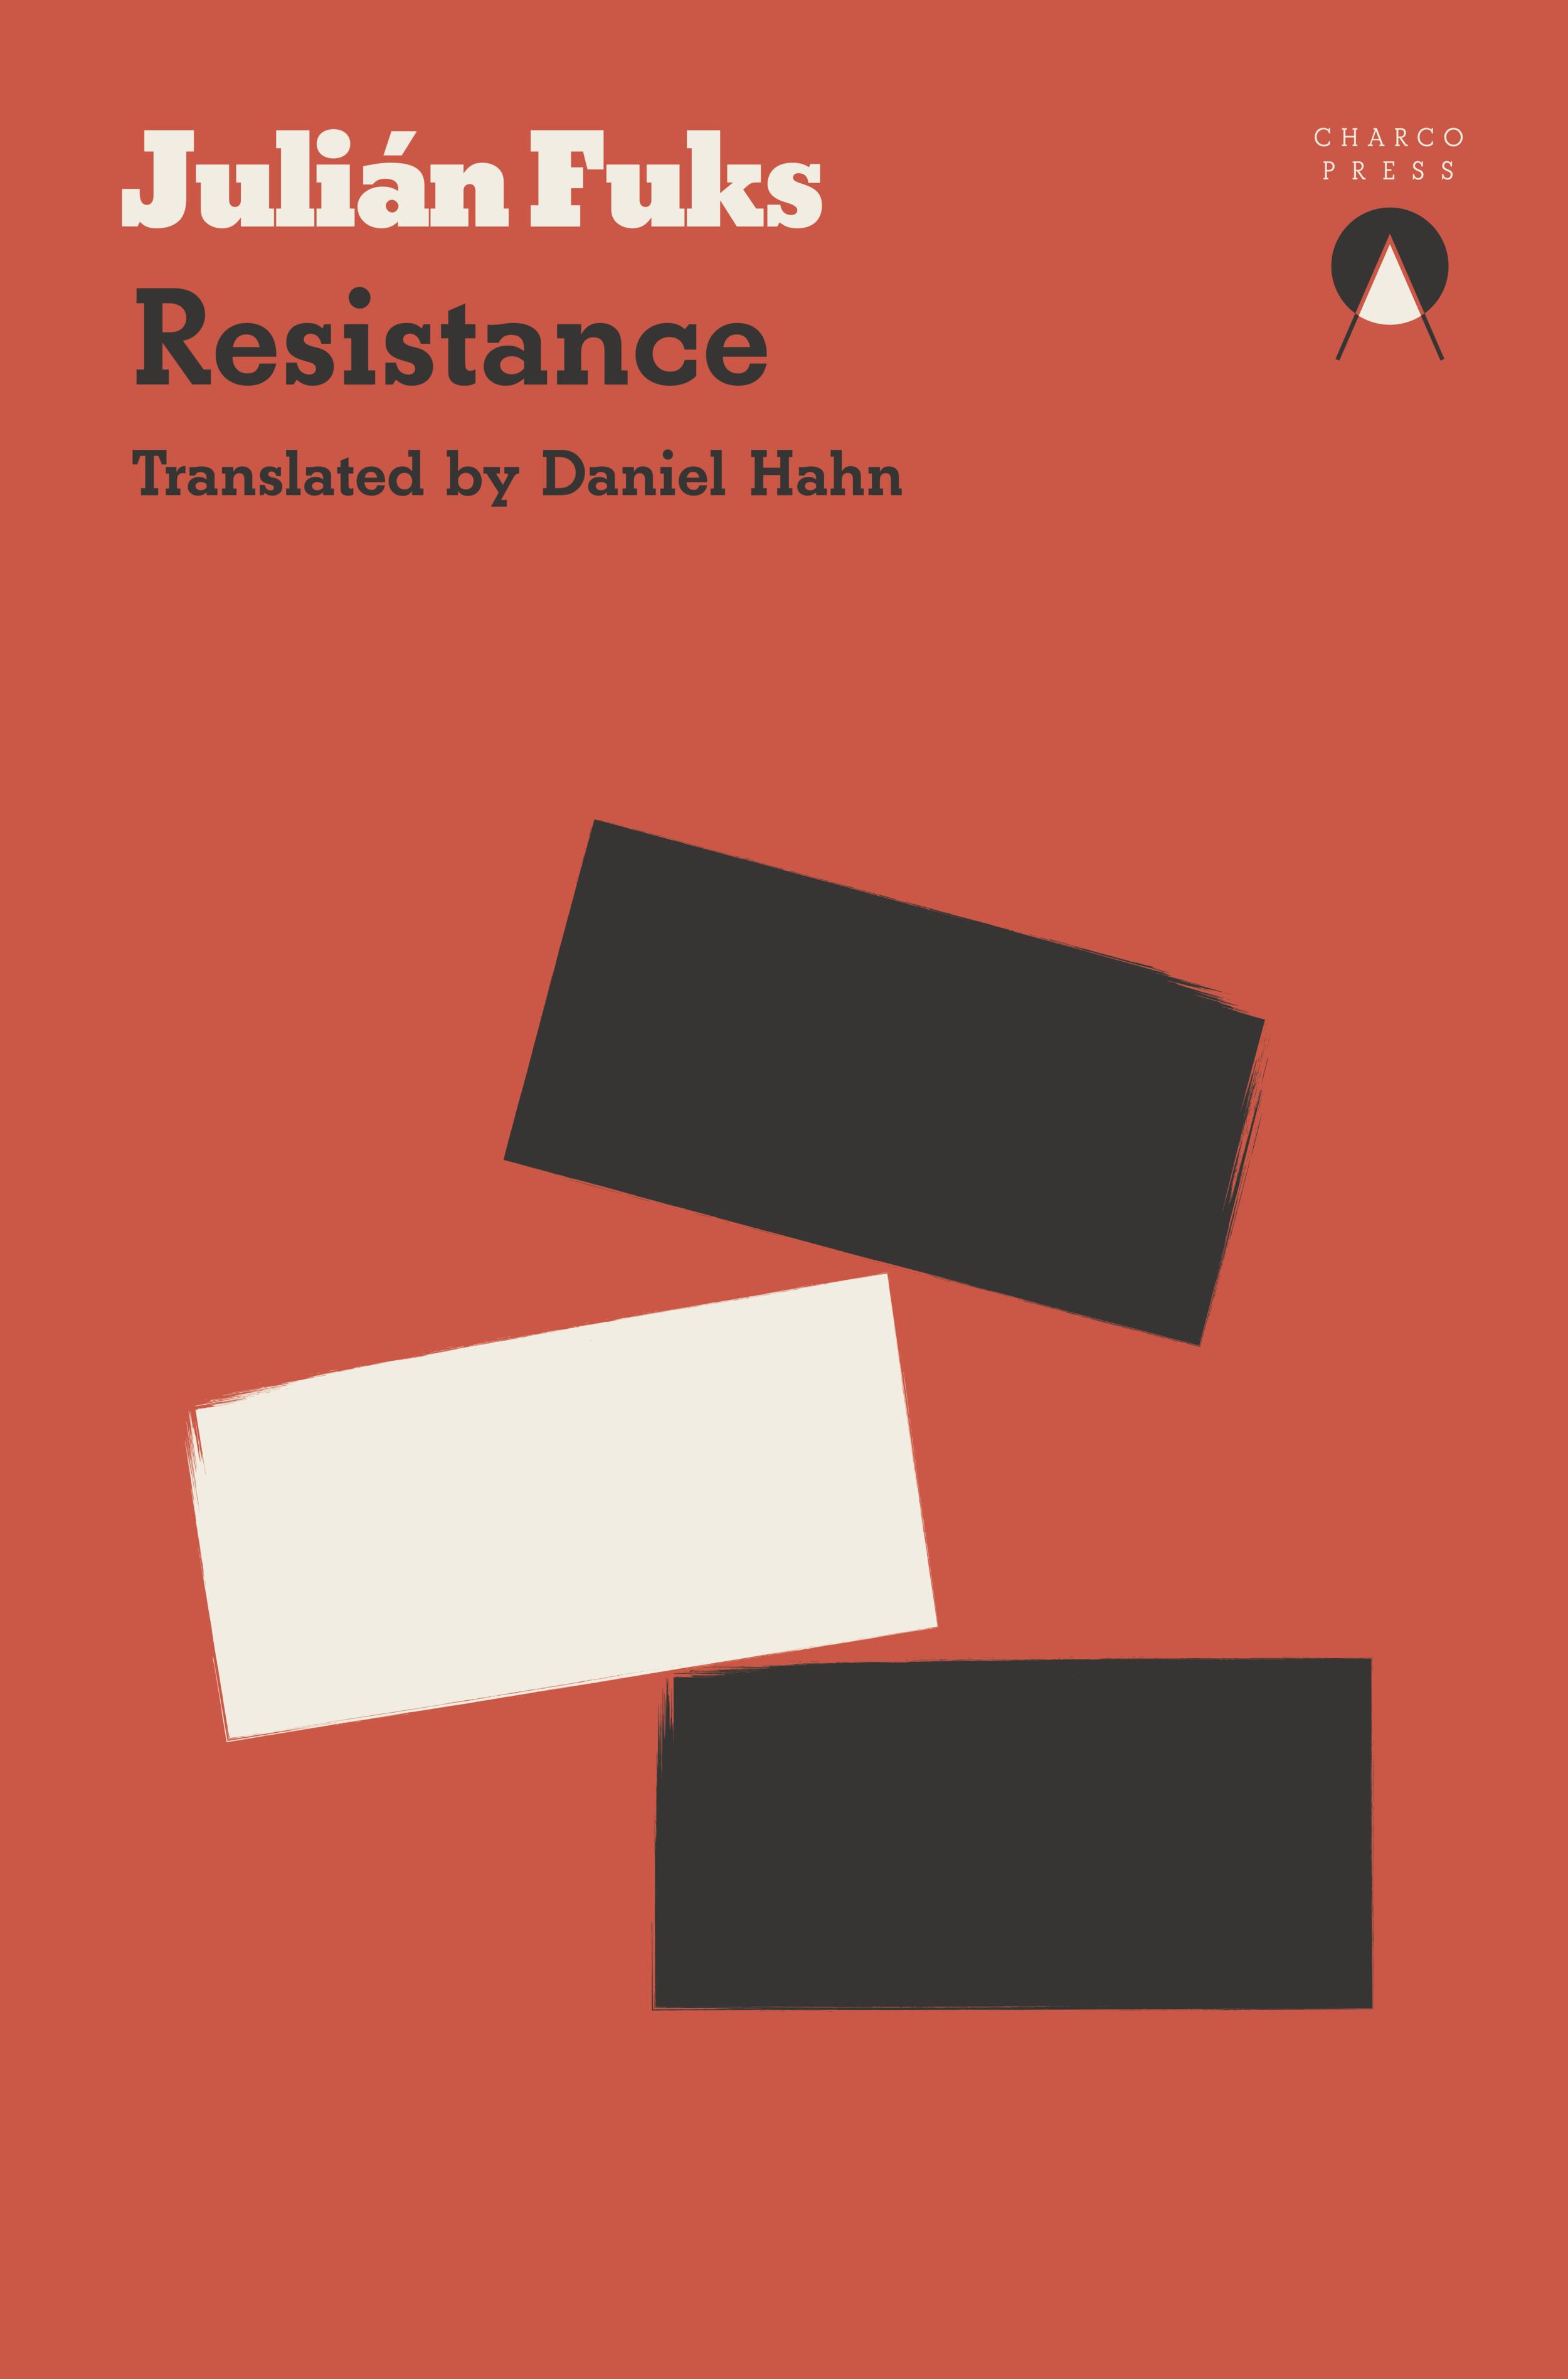 Resistance by Julián Fuks (tr. Daniel Hahn), by Charco Press